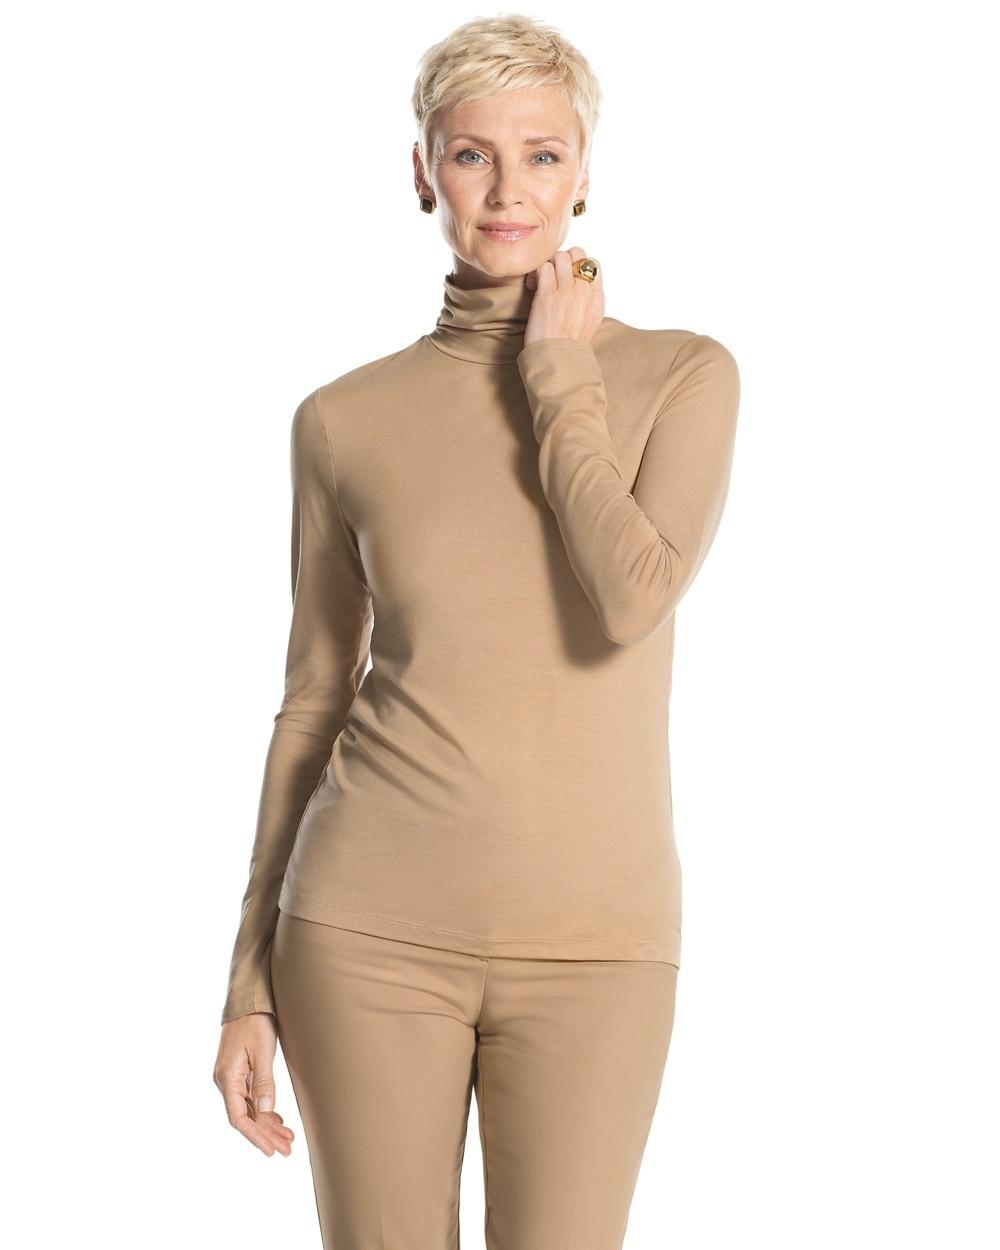 613b7cd8942 Clothing - Women s Tops - Chico s